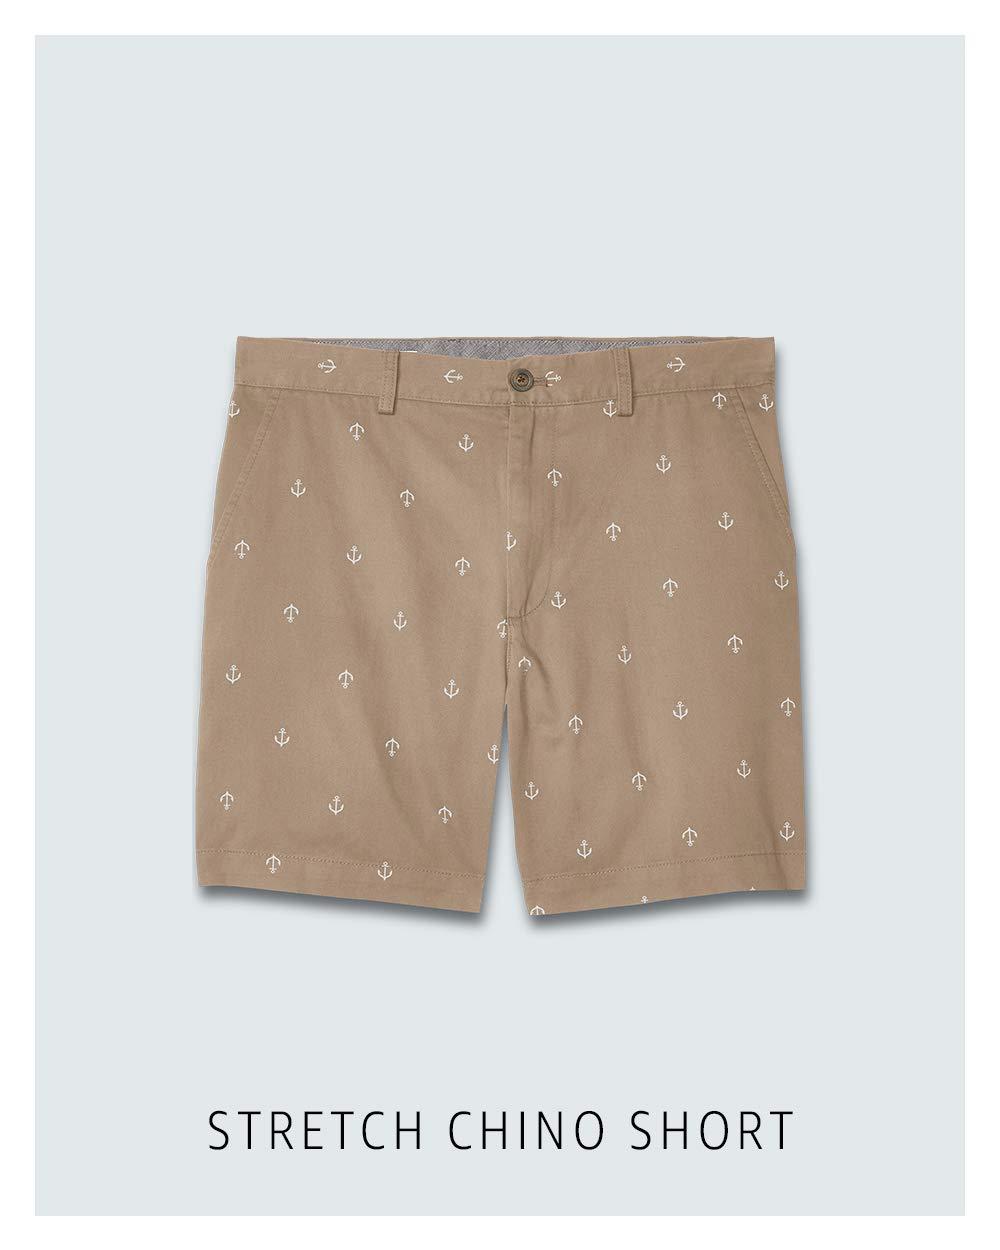 Stretch chino short